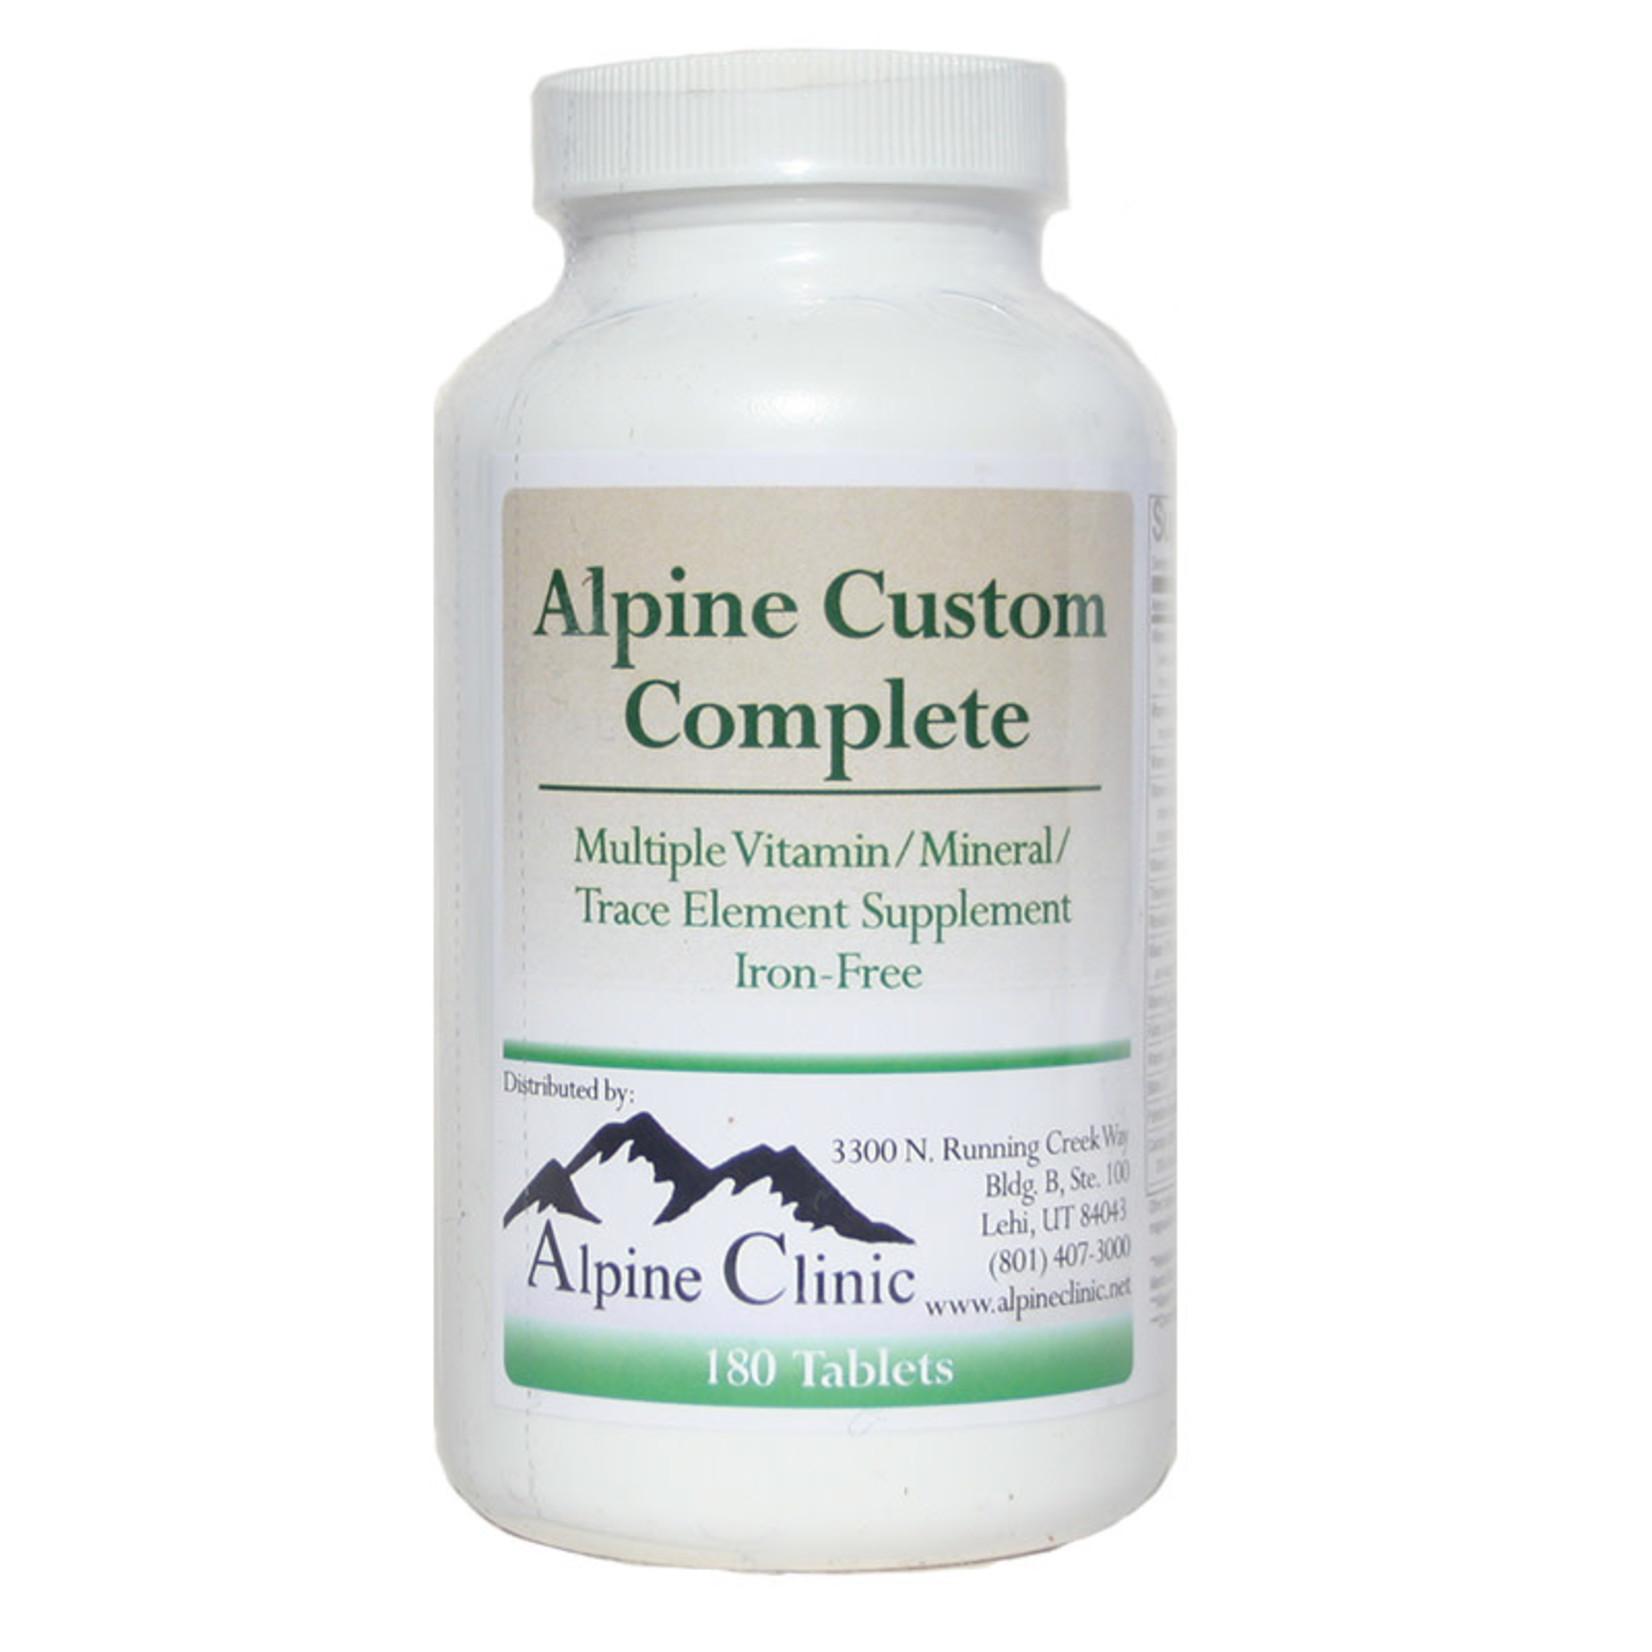 Alpine Clinic PL Alpine Custom Complete